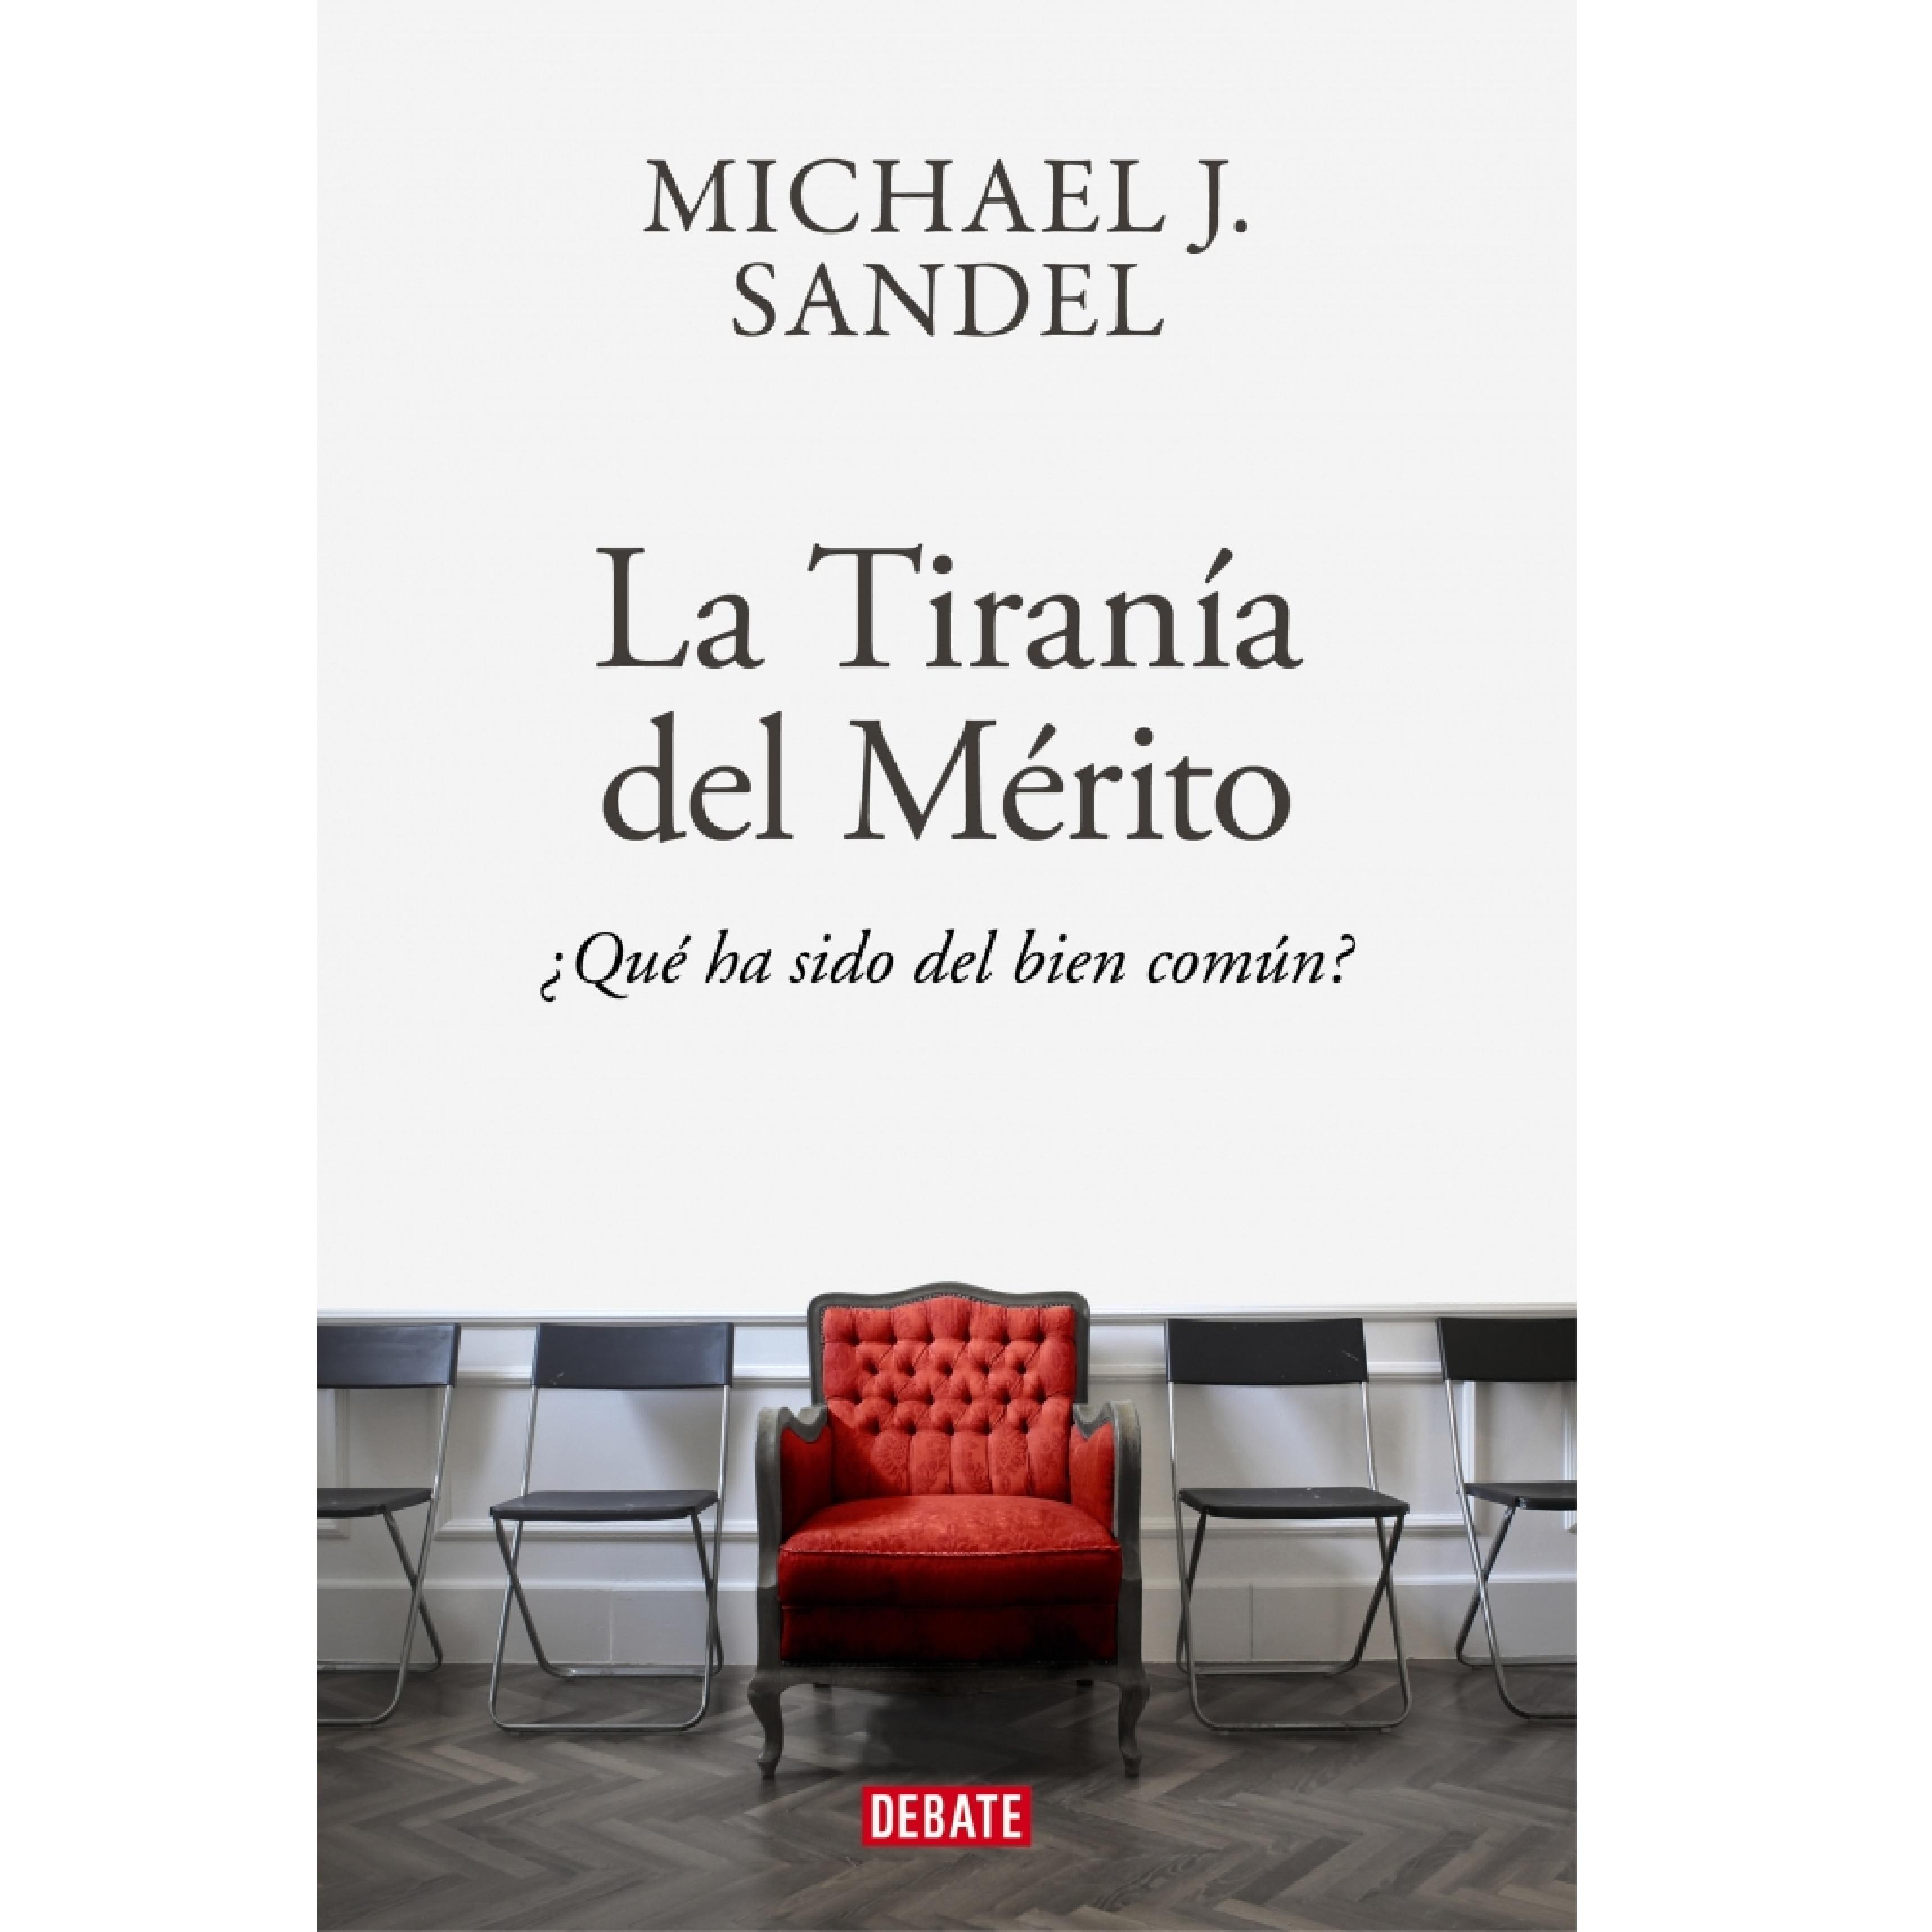 Portada de 'La tiranía del mérito', de Michael J. Sandel.